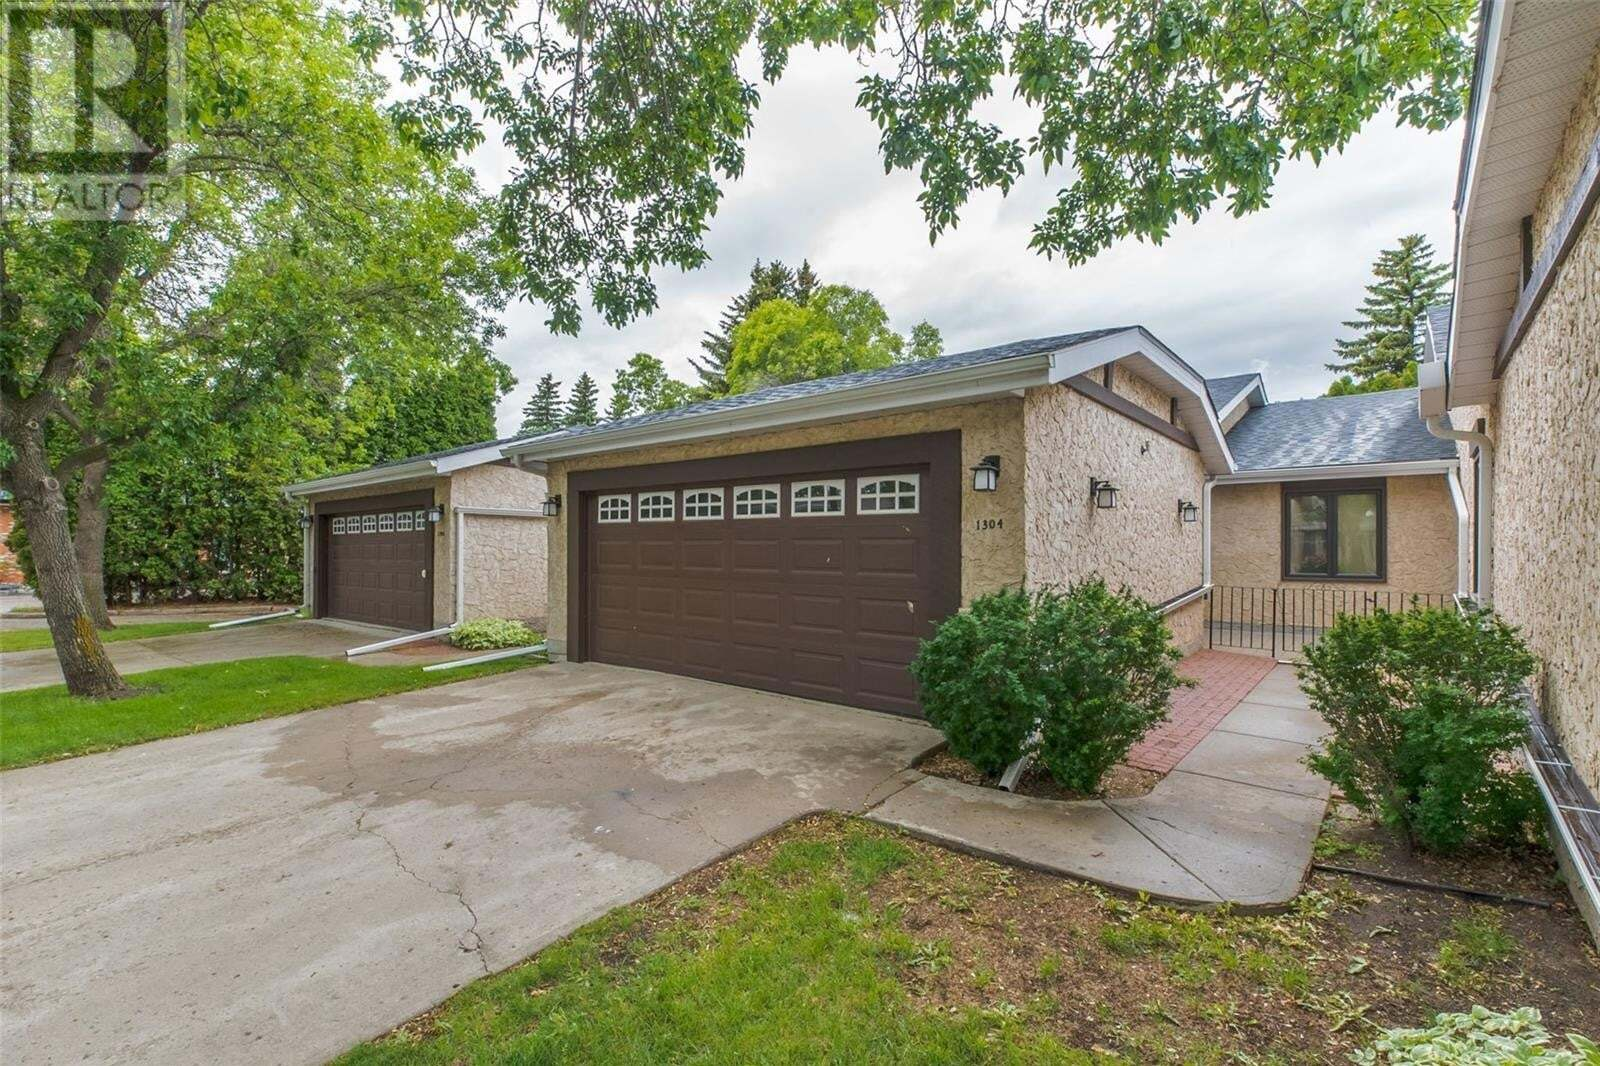 Townhouse for sale at 1304 Gryphons Wk Regina Saskatchewan - MLS: SK813766